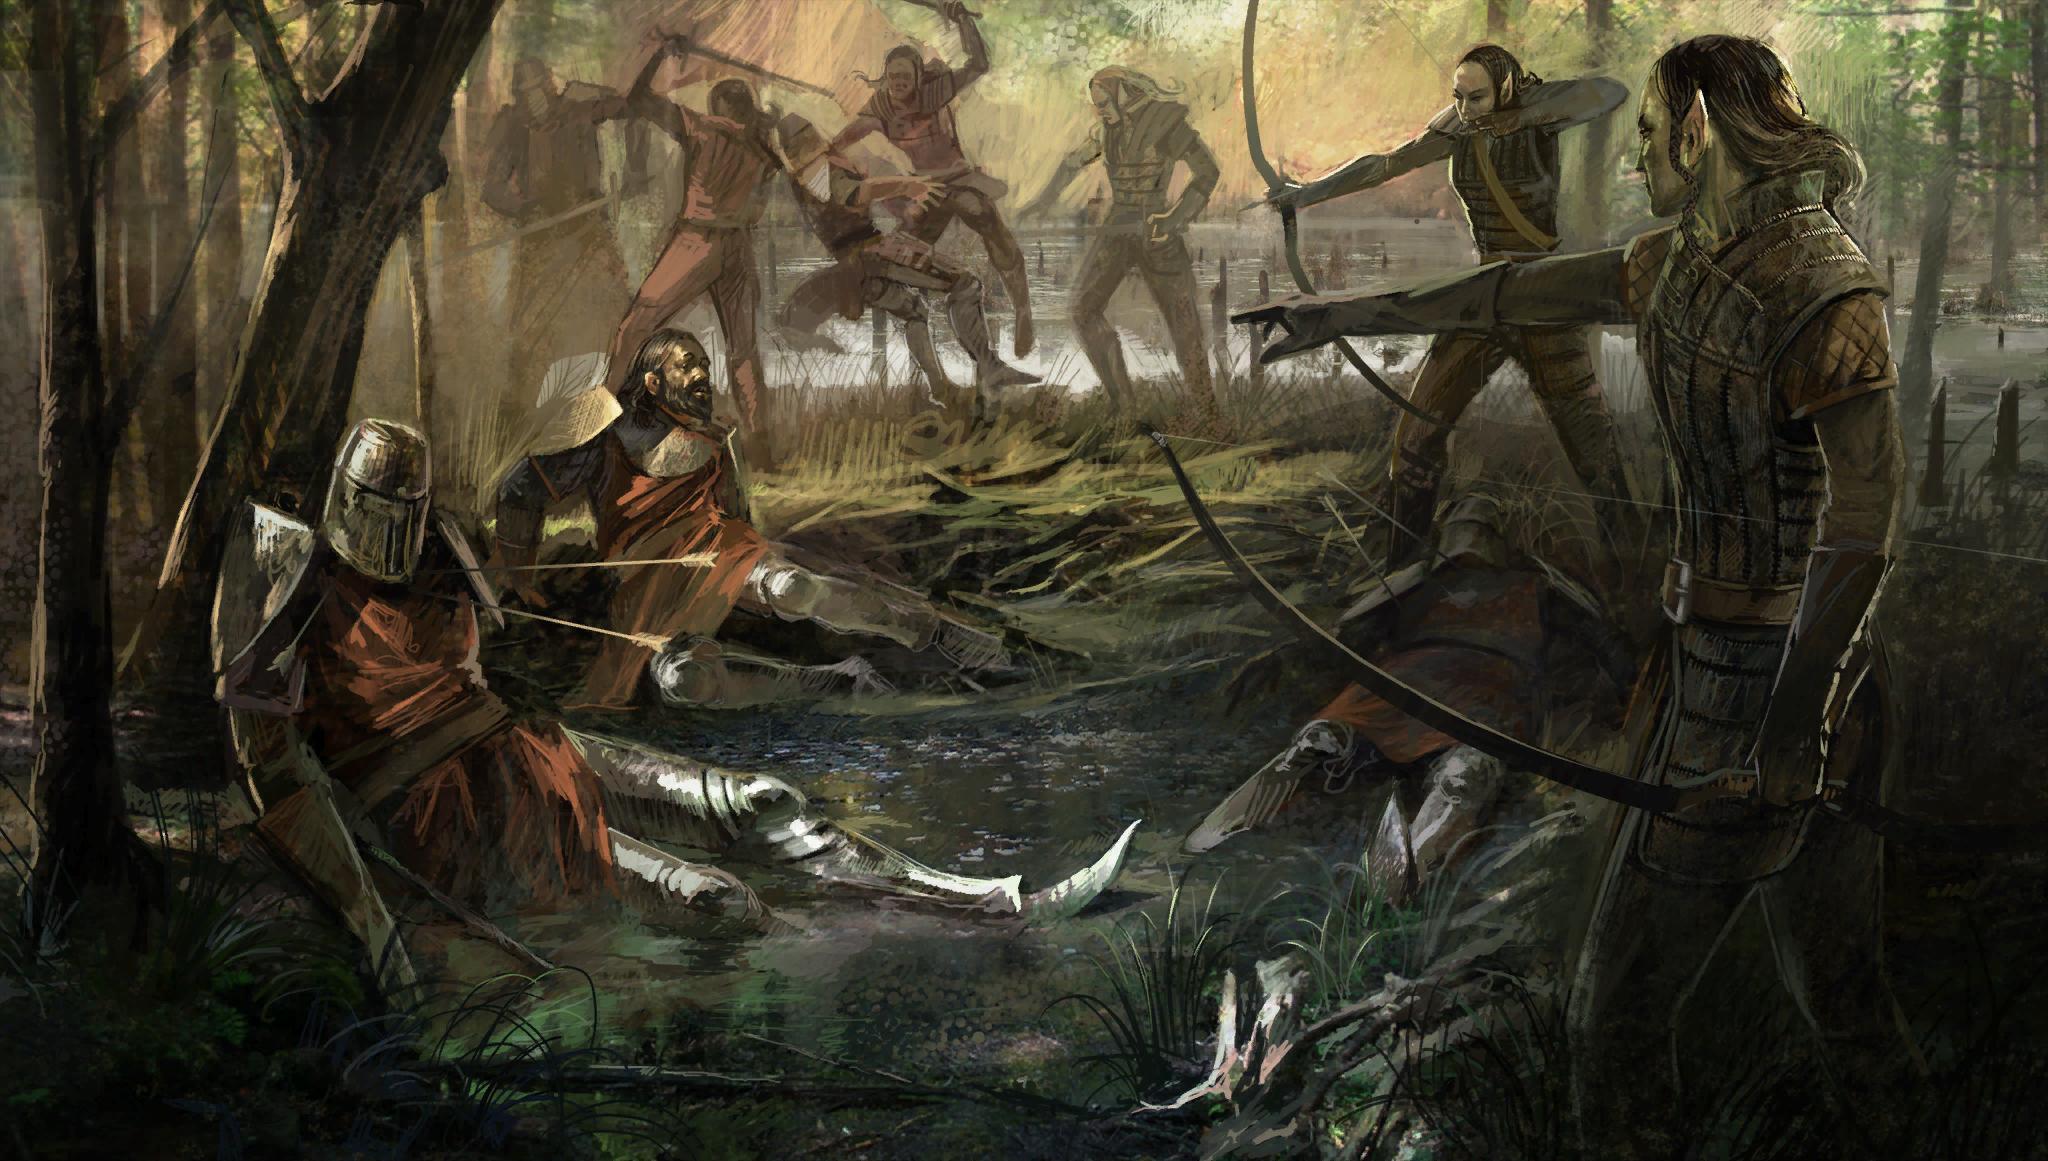 Elves Wallpapers Top Free Elves Backgrounds Wallpaperaccess